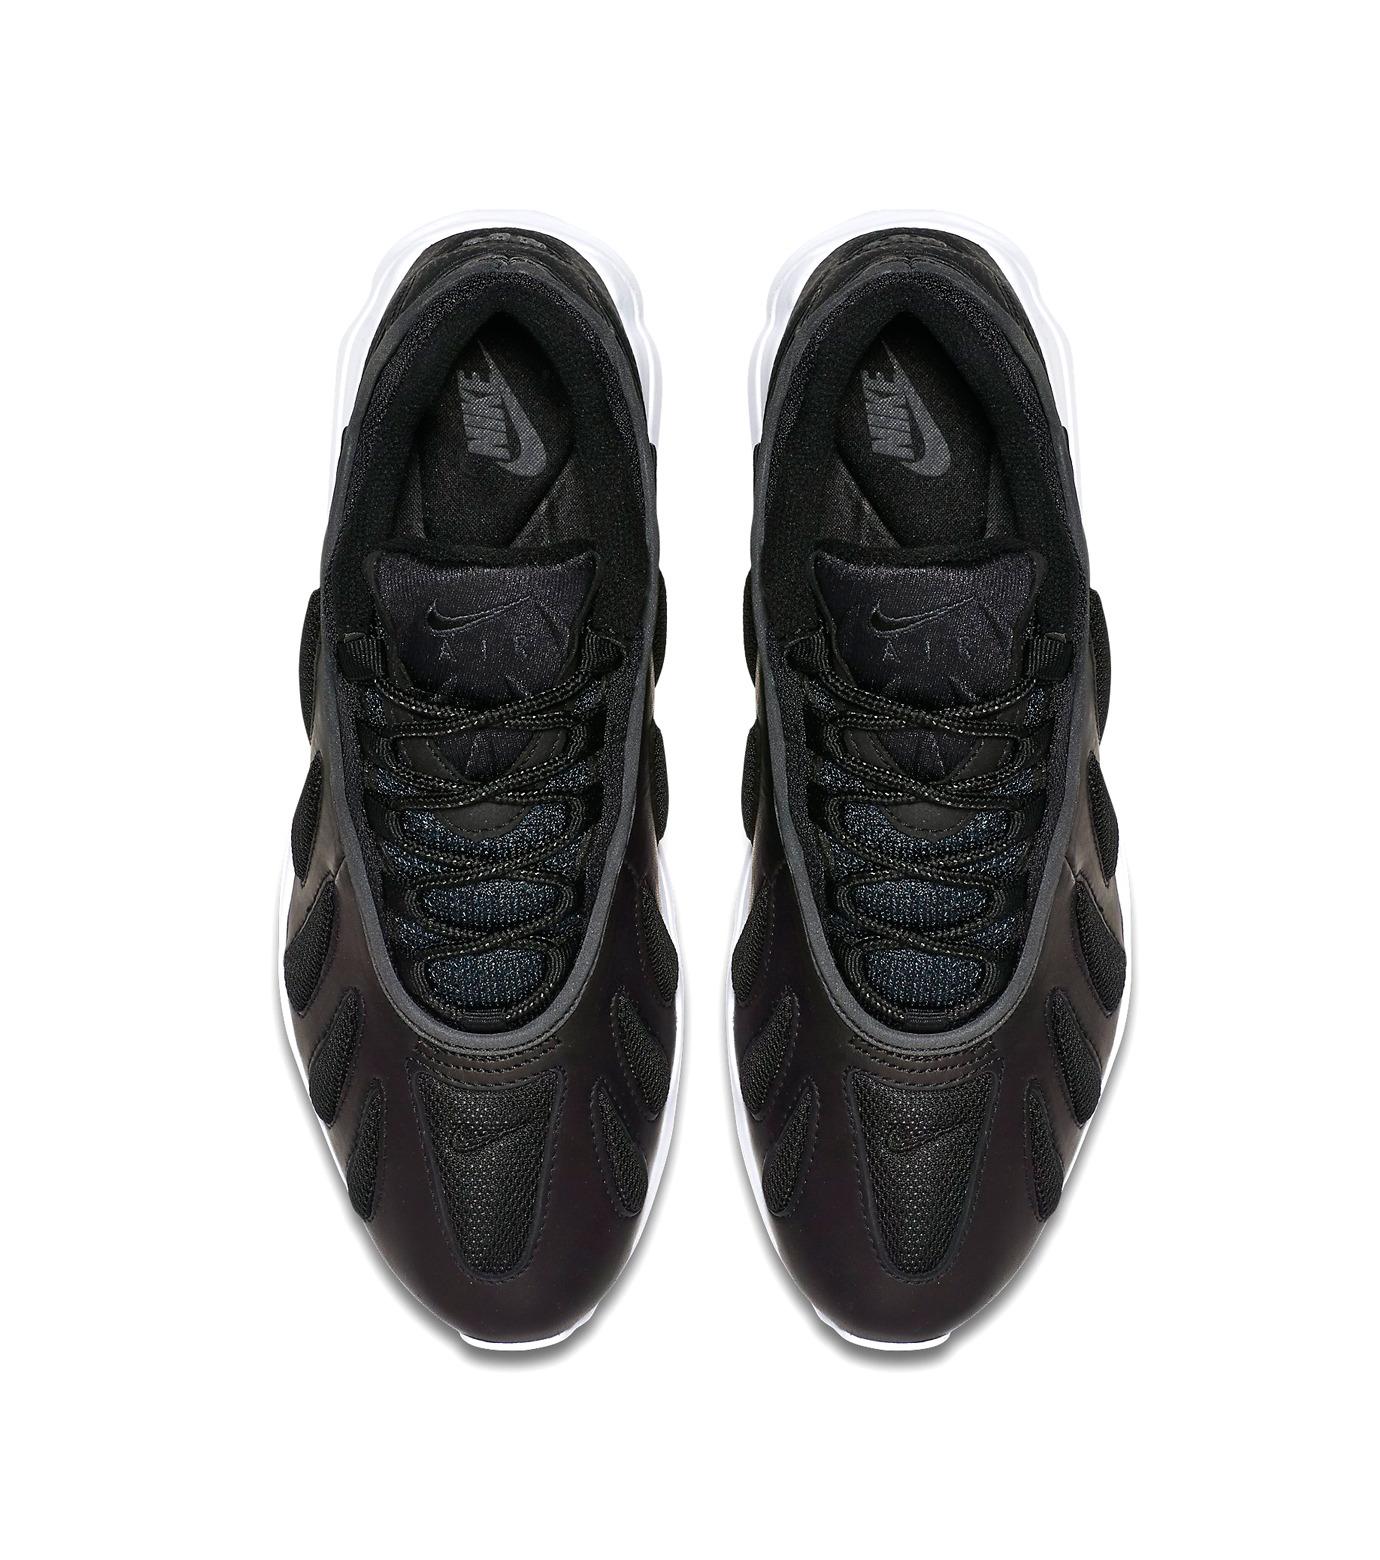 NIKE(ナイキ)のAIR MAX 96 XX-BLACK(シューズ/shoes)-870165-002-13 拡大詳細画像4